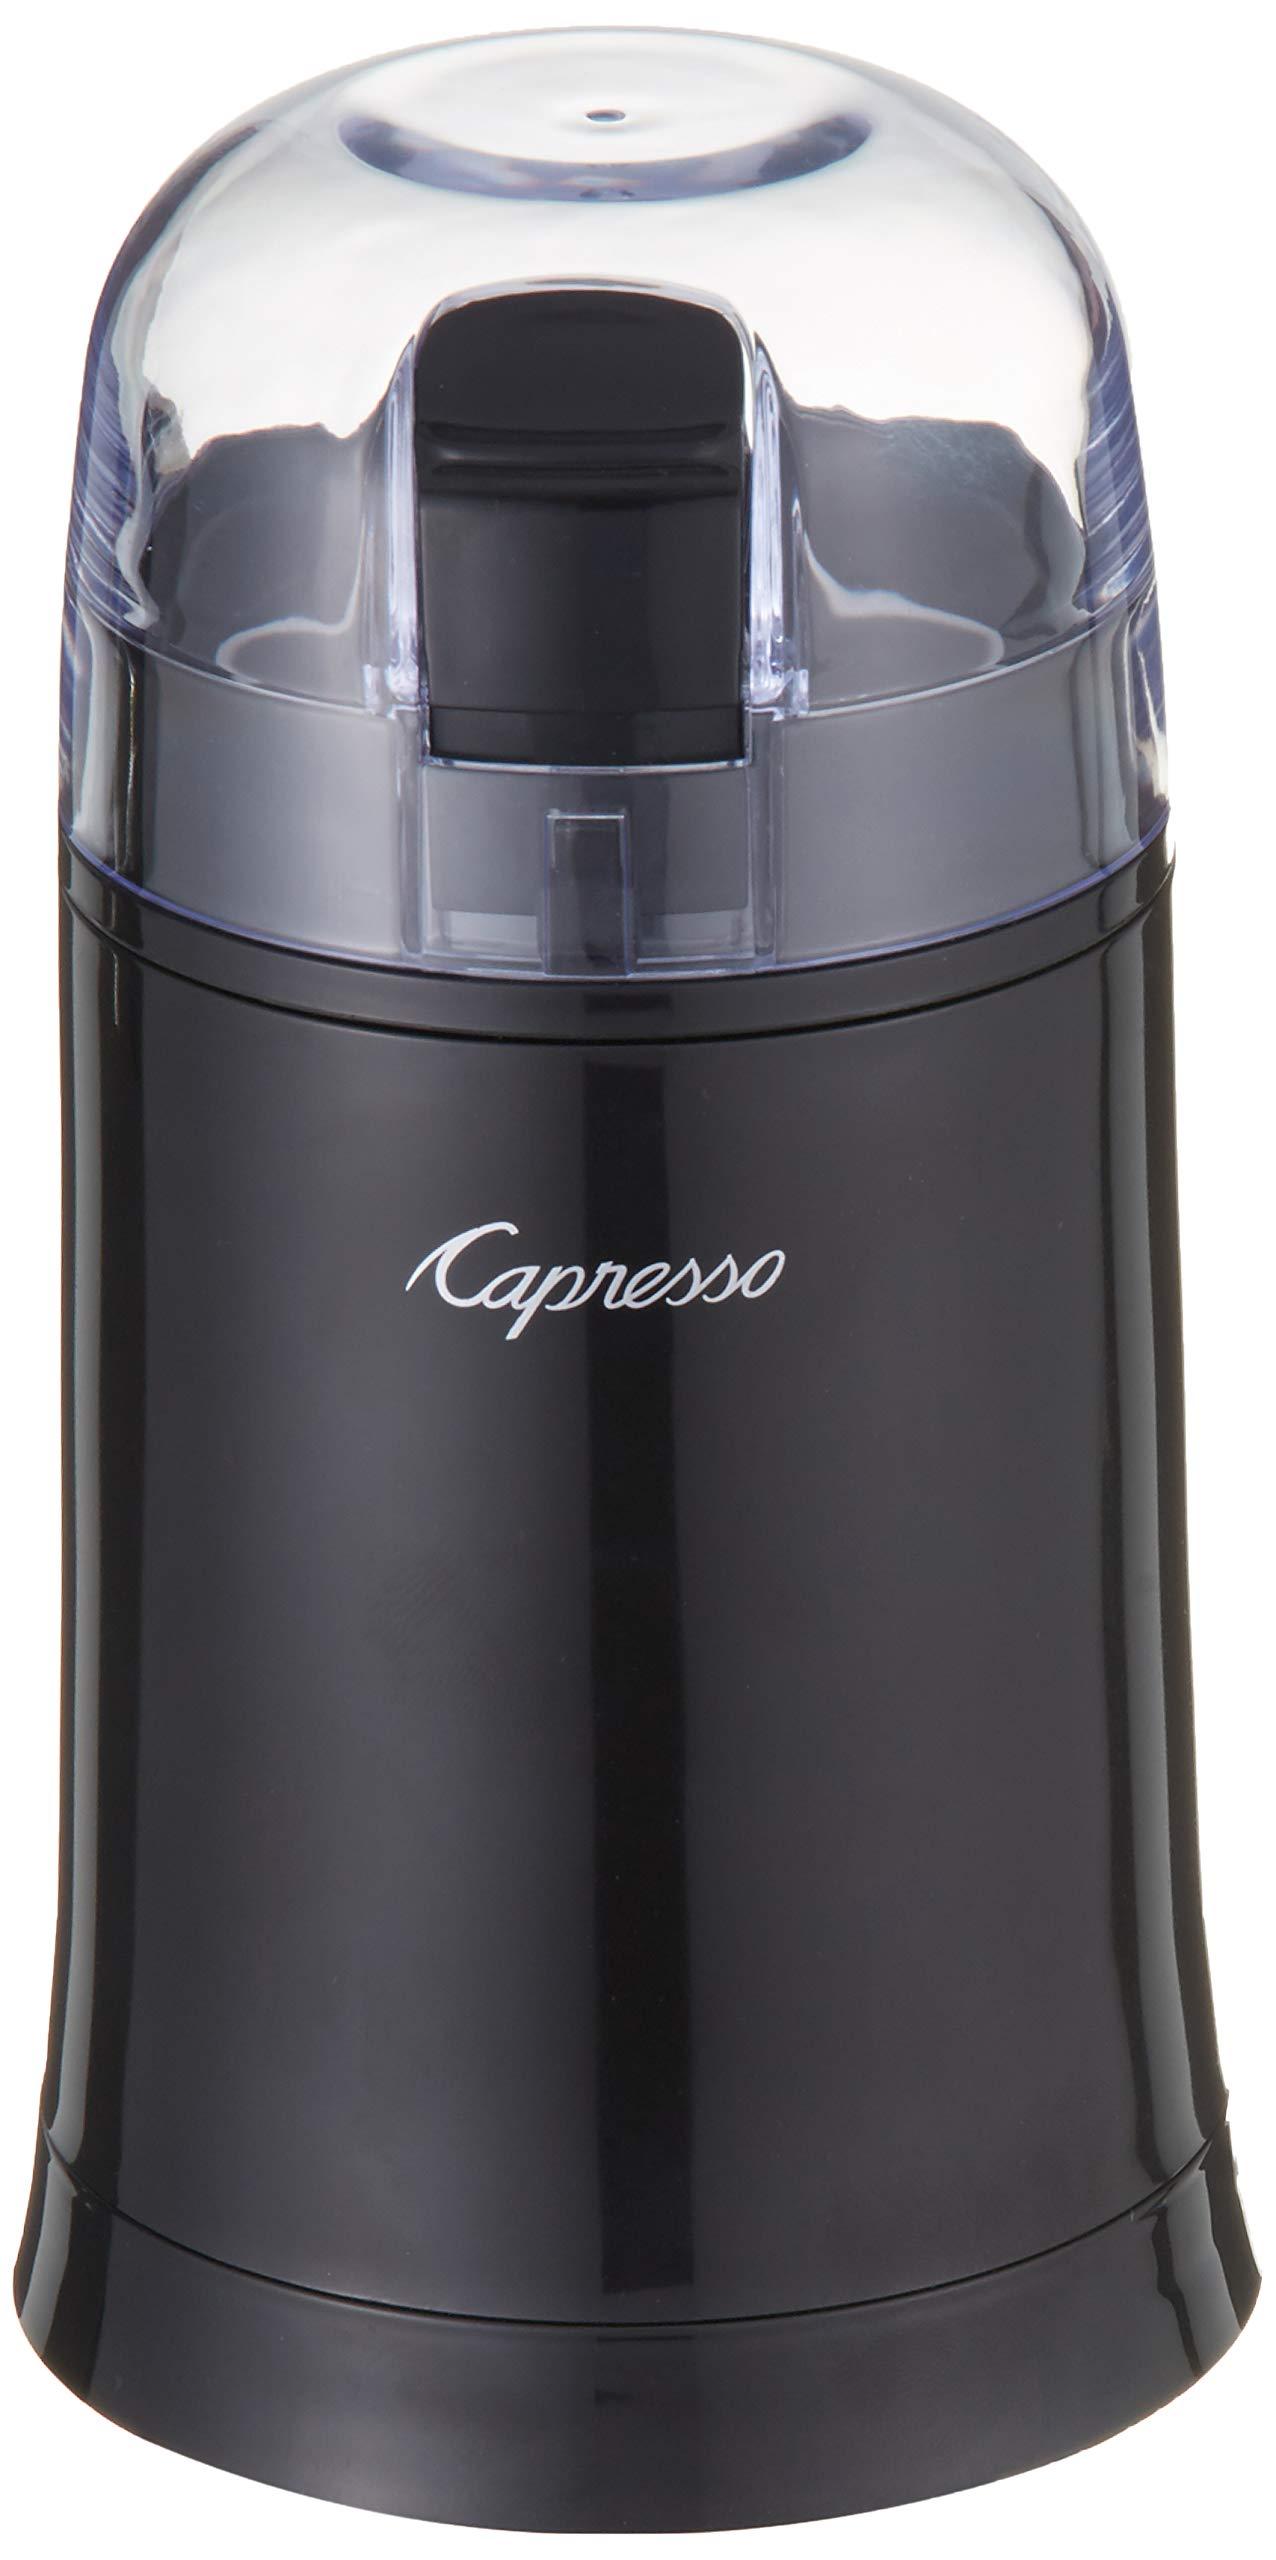 Capresso 505.01 Cool Grind Coffee/Spice Grinder, Black by Capresso